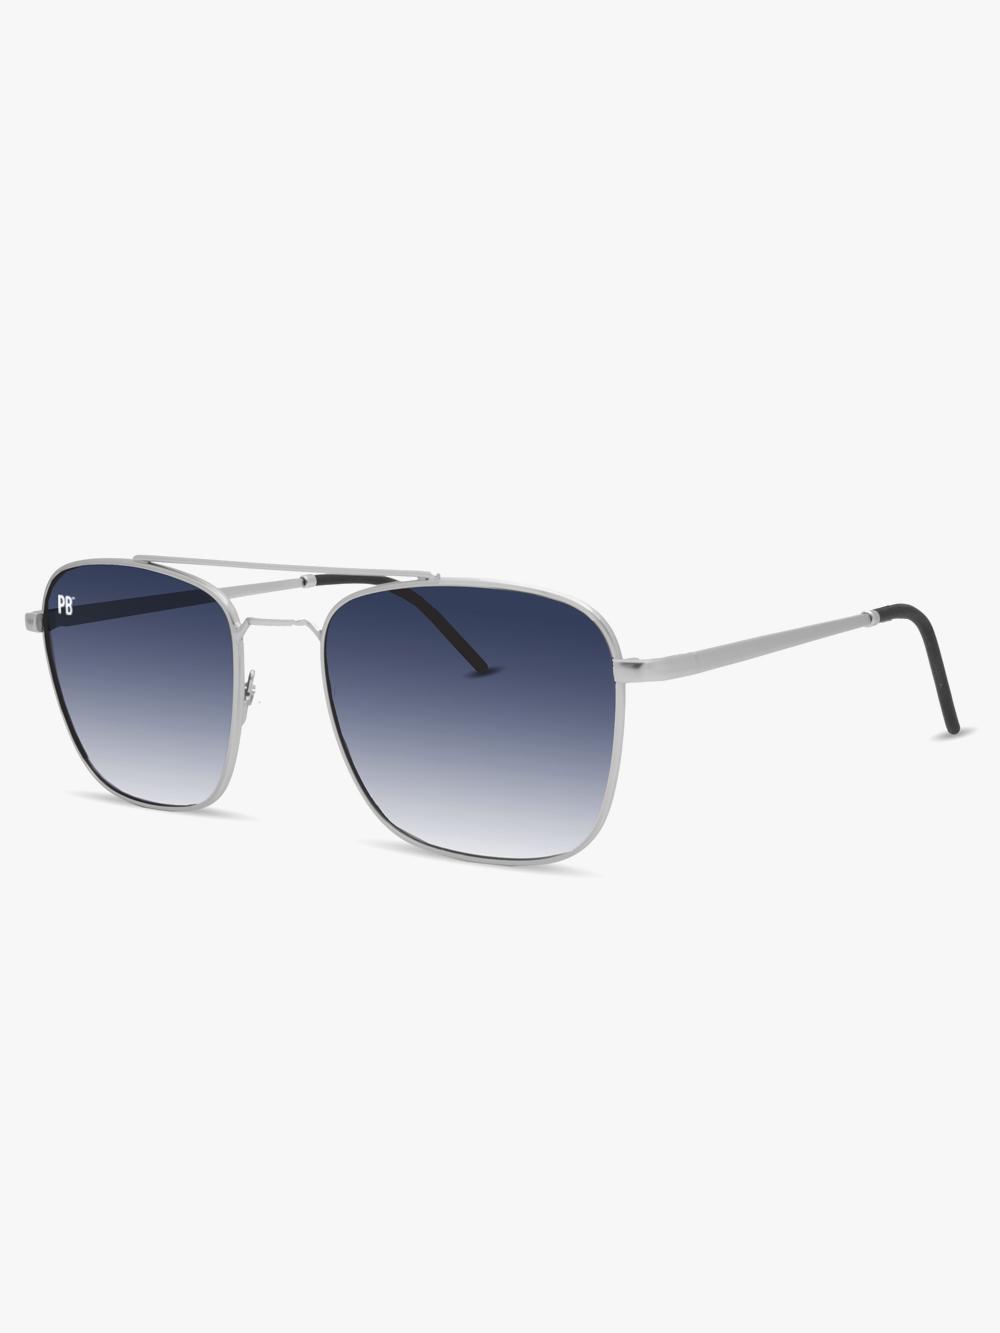 PB-Sunglasses-Legend-Silver-Gradient-Blue